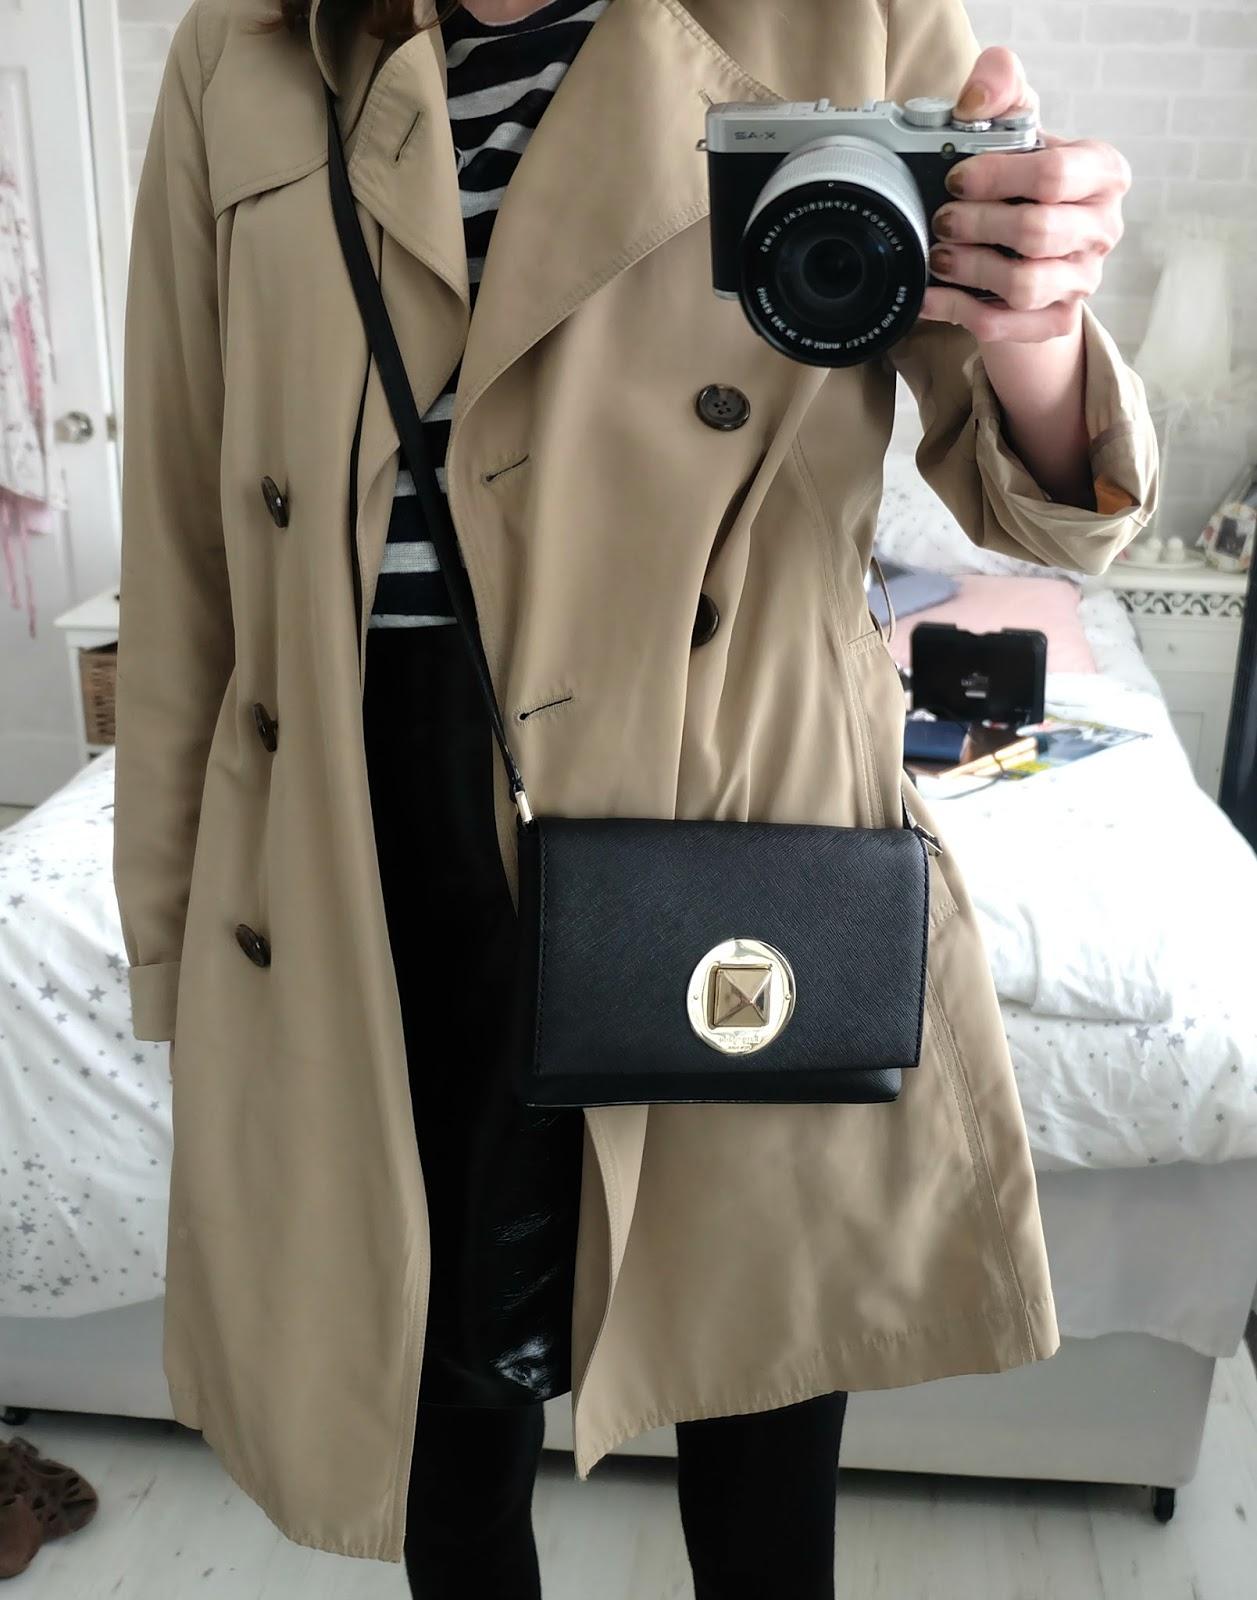 uniqlo trench coat, topshop stripe heart top, new look patent skirt, RAID alexus shoes, nine by savannah miller baker boy hat, kate spade sally bag